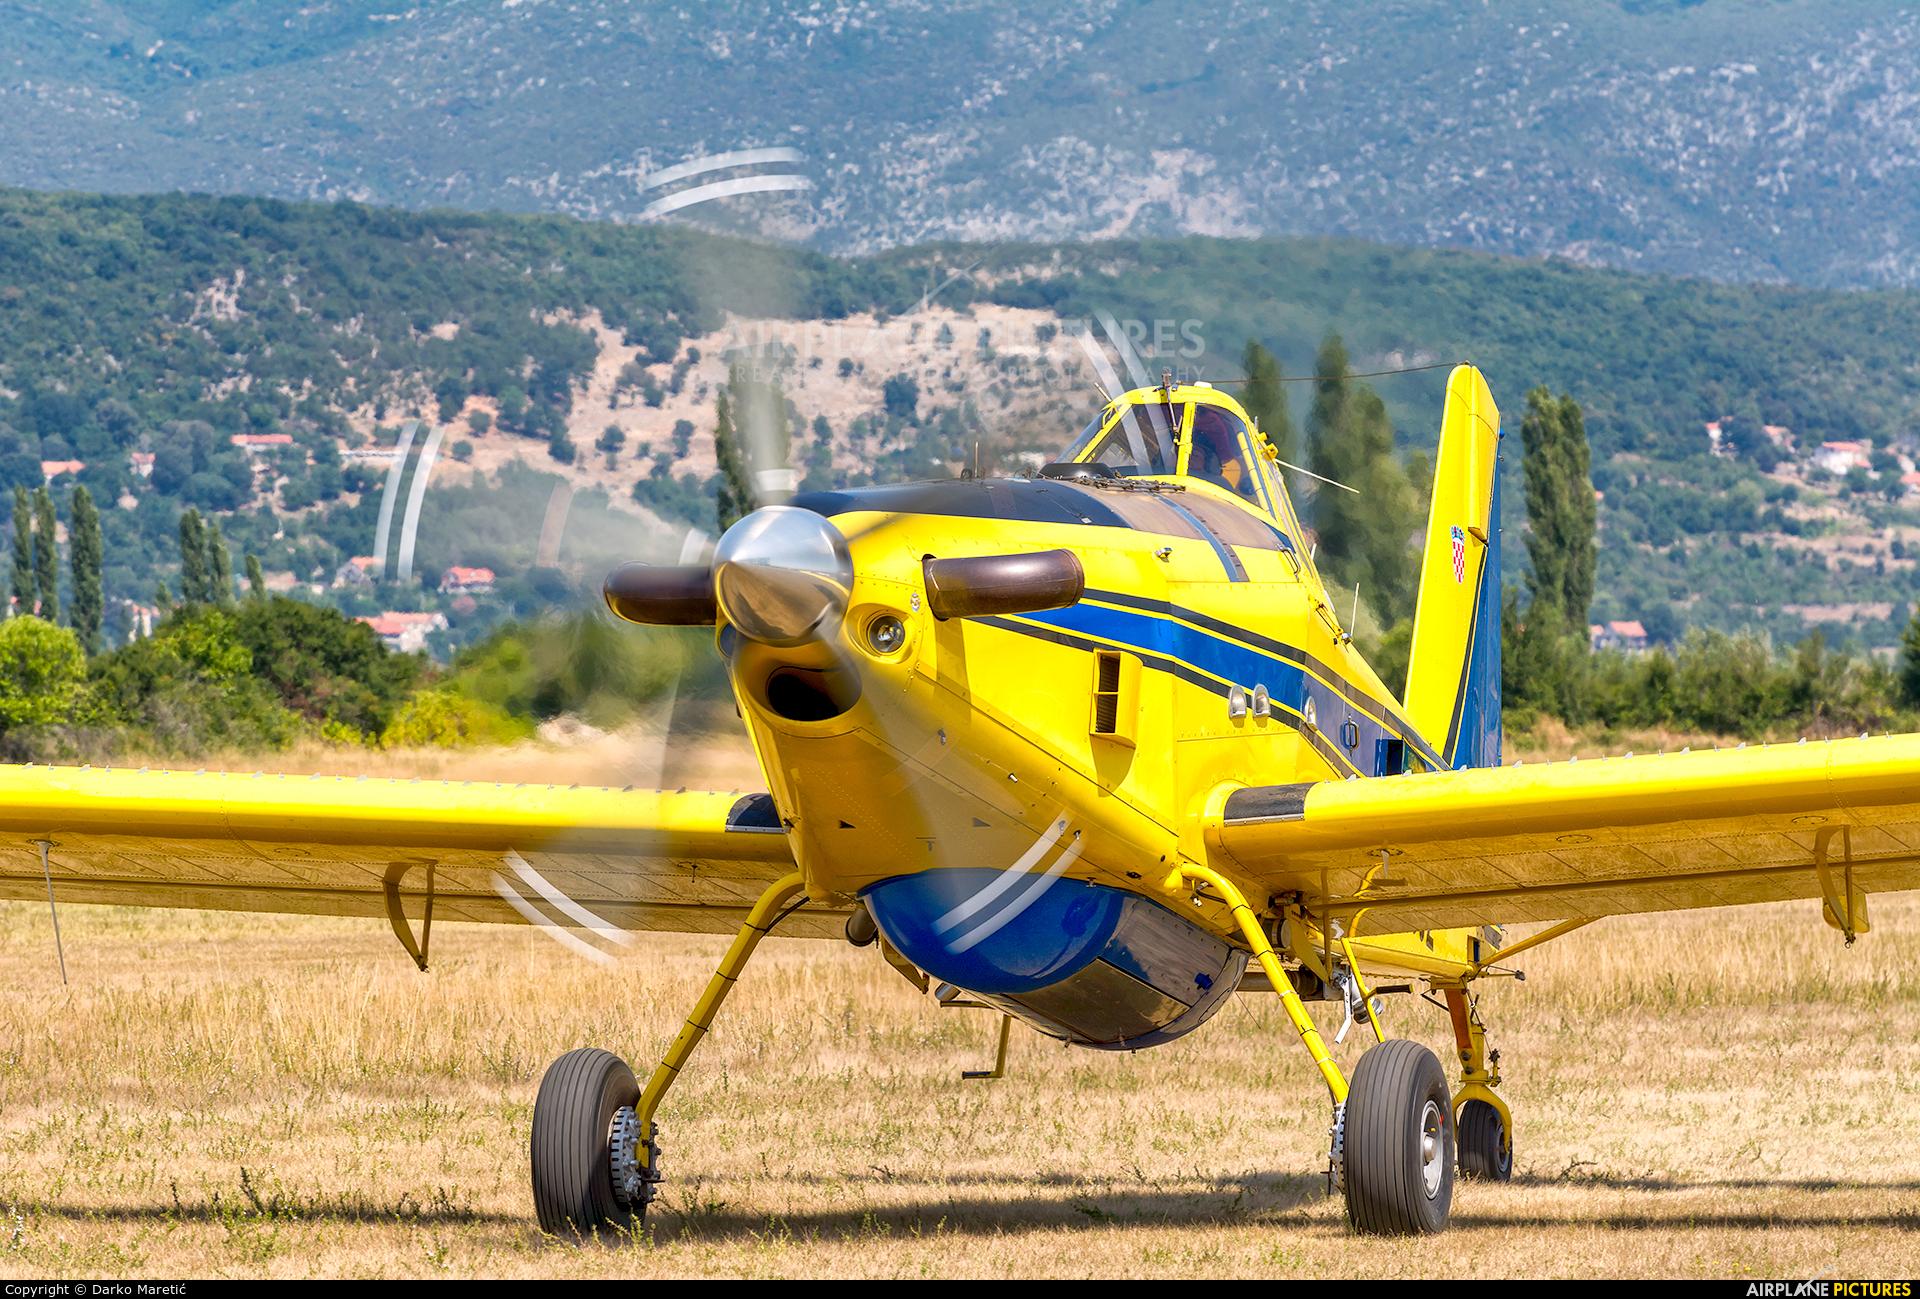 Croatia - Air Force 892 aircraft at Sinj Airfield